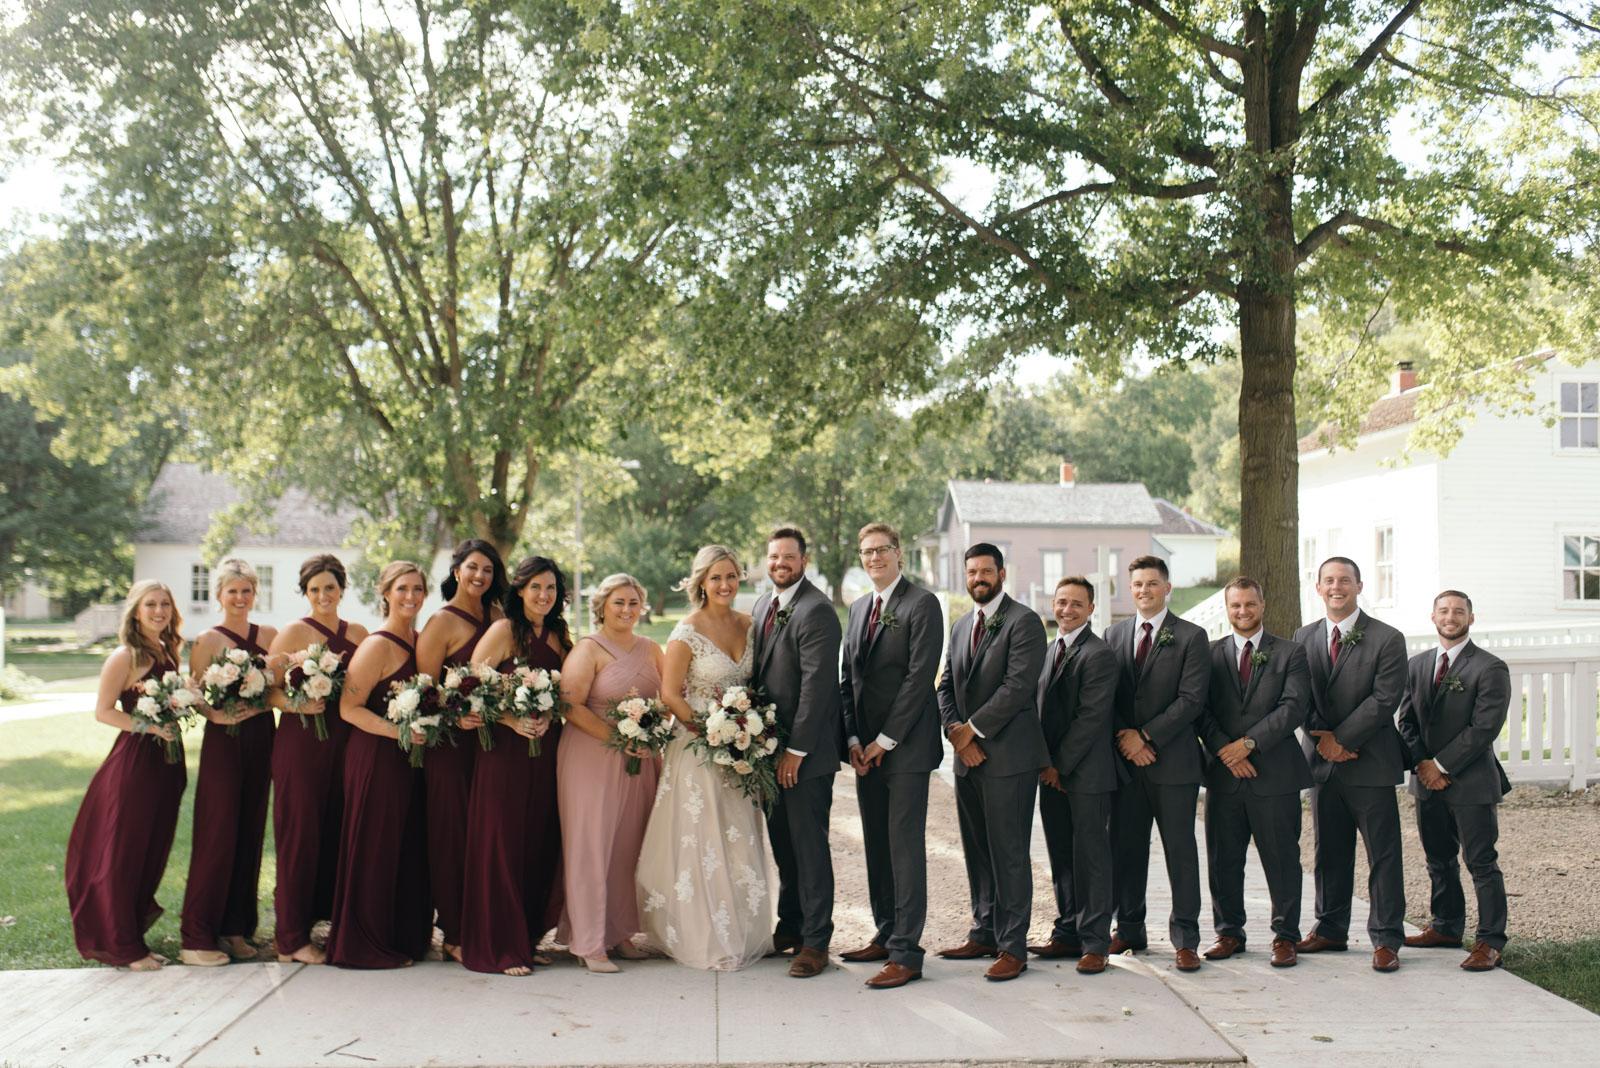 bridal party at Ushers Ferry Historic Village wedding